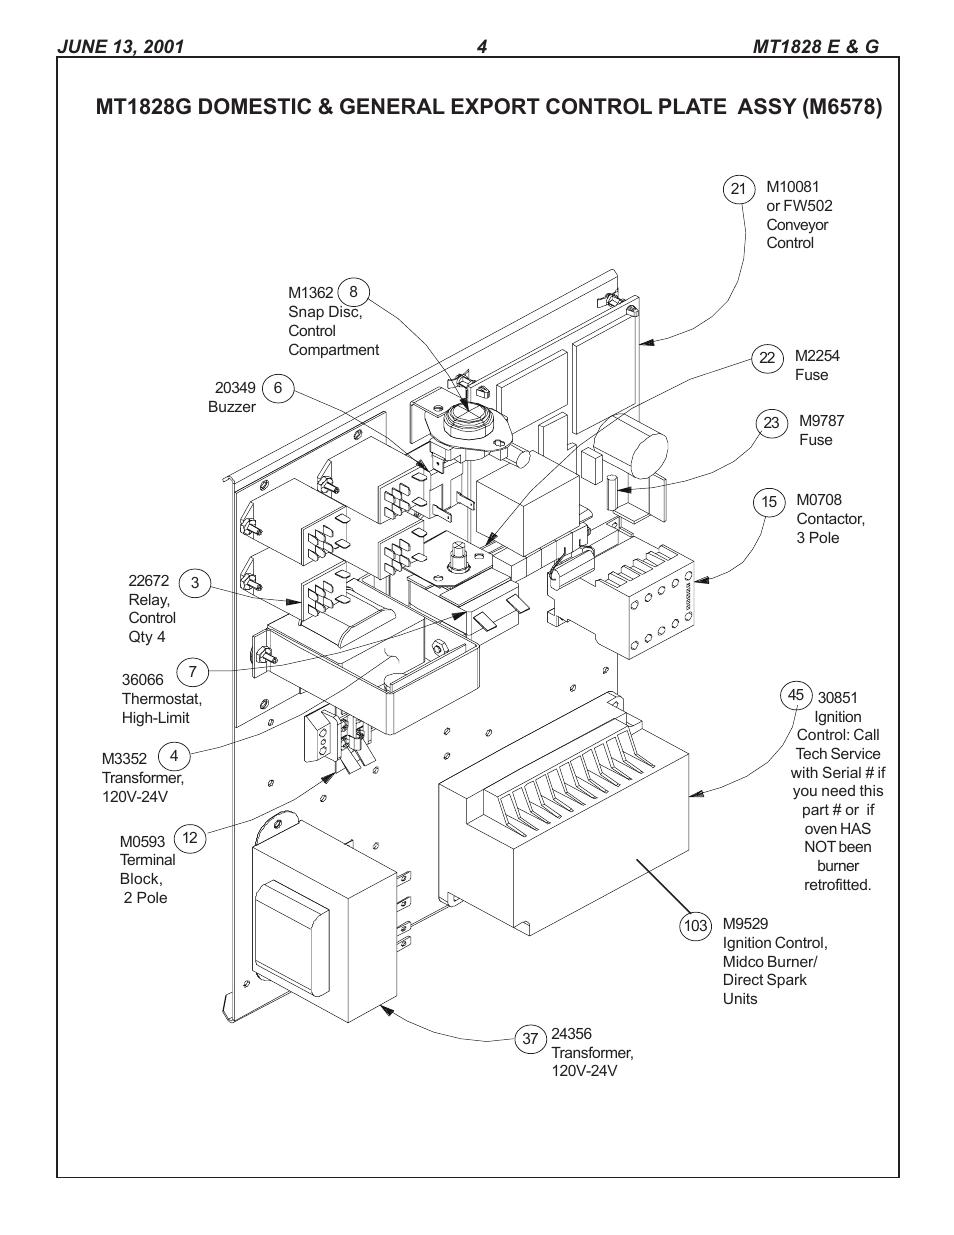 Blodgett Mark V 111 Wiring Diagram Schematics Crown Boiler Oven Parts Manuals Data Diagrams U2022